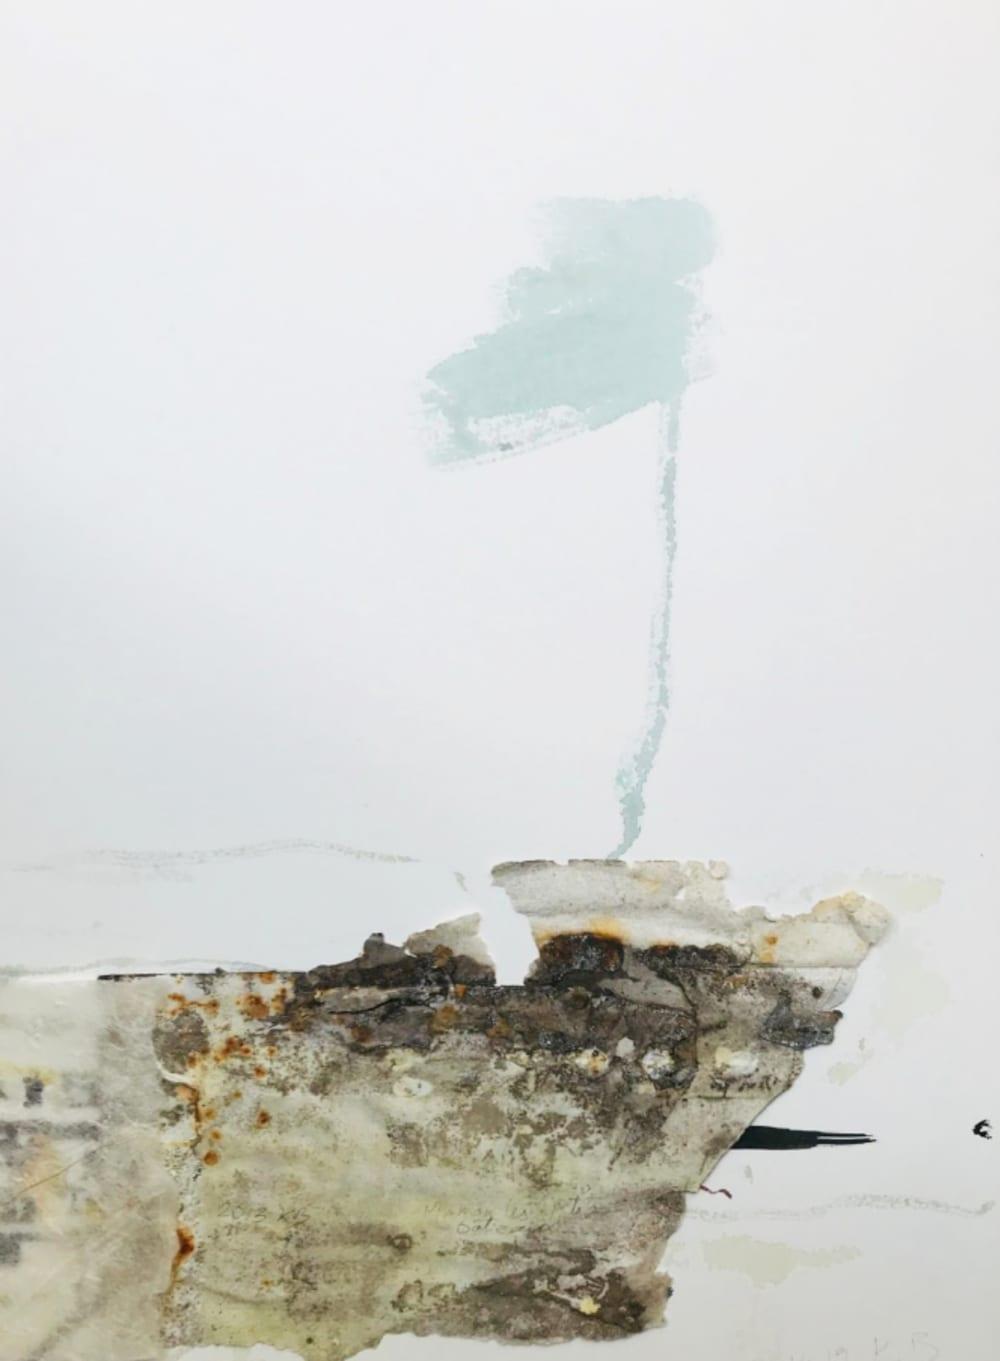 Le départ en mer - Karin Boinet